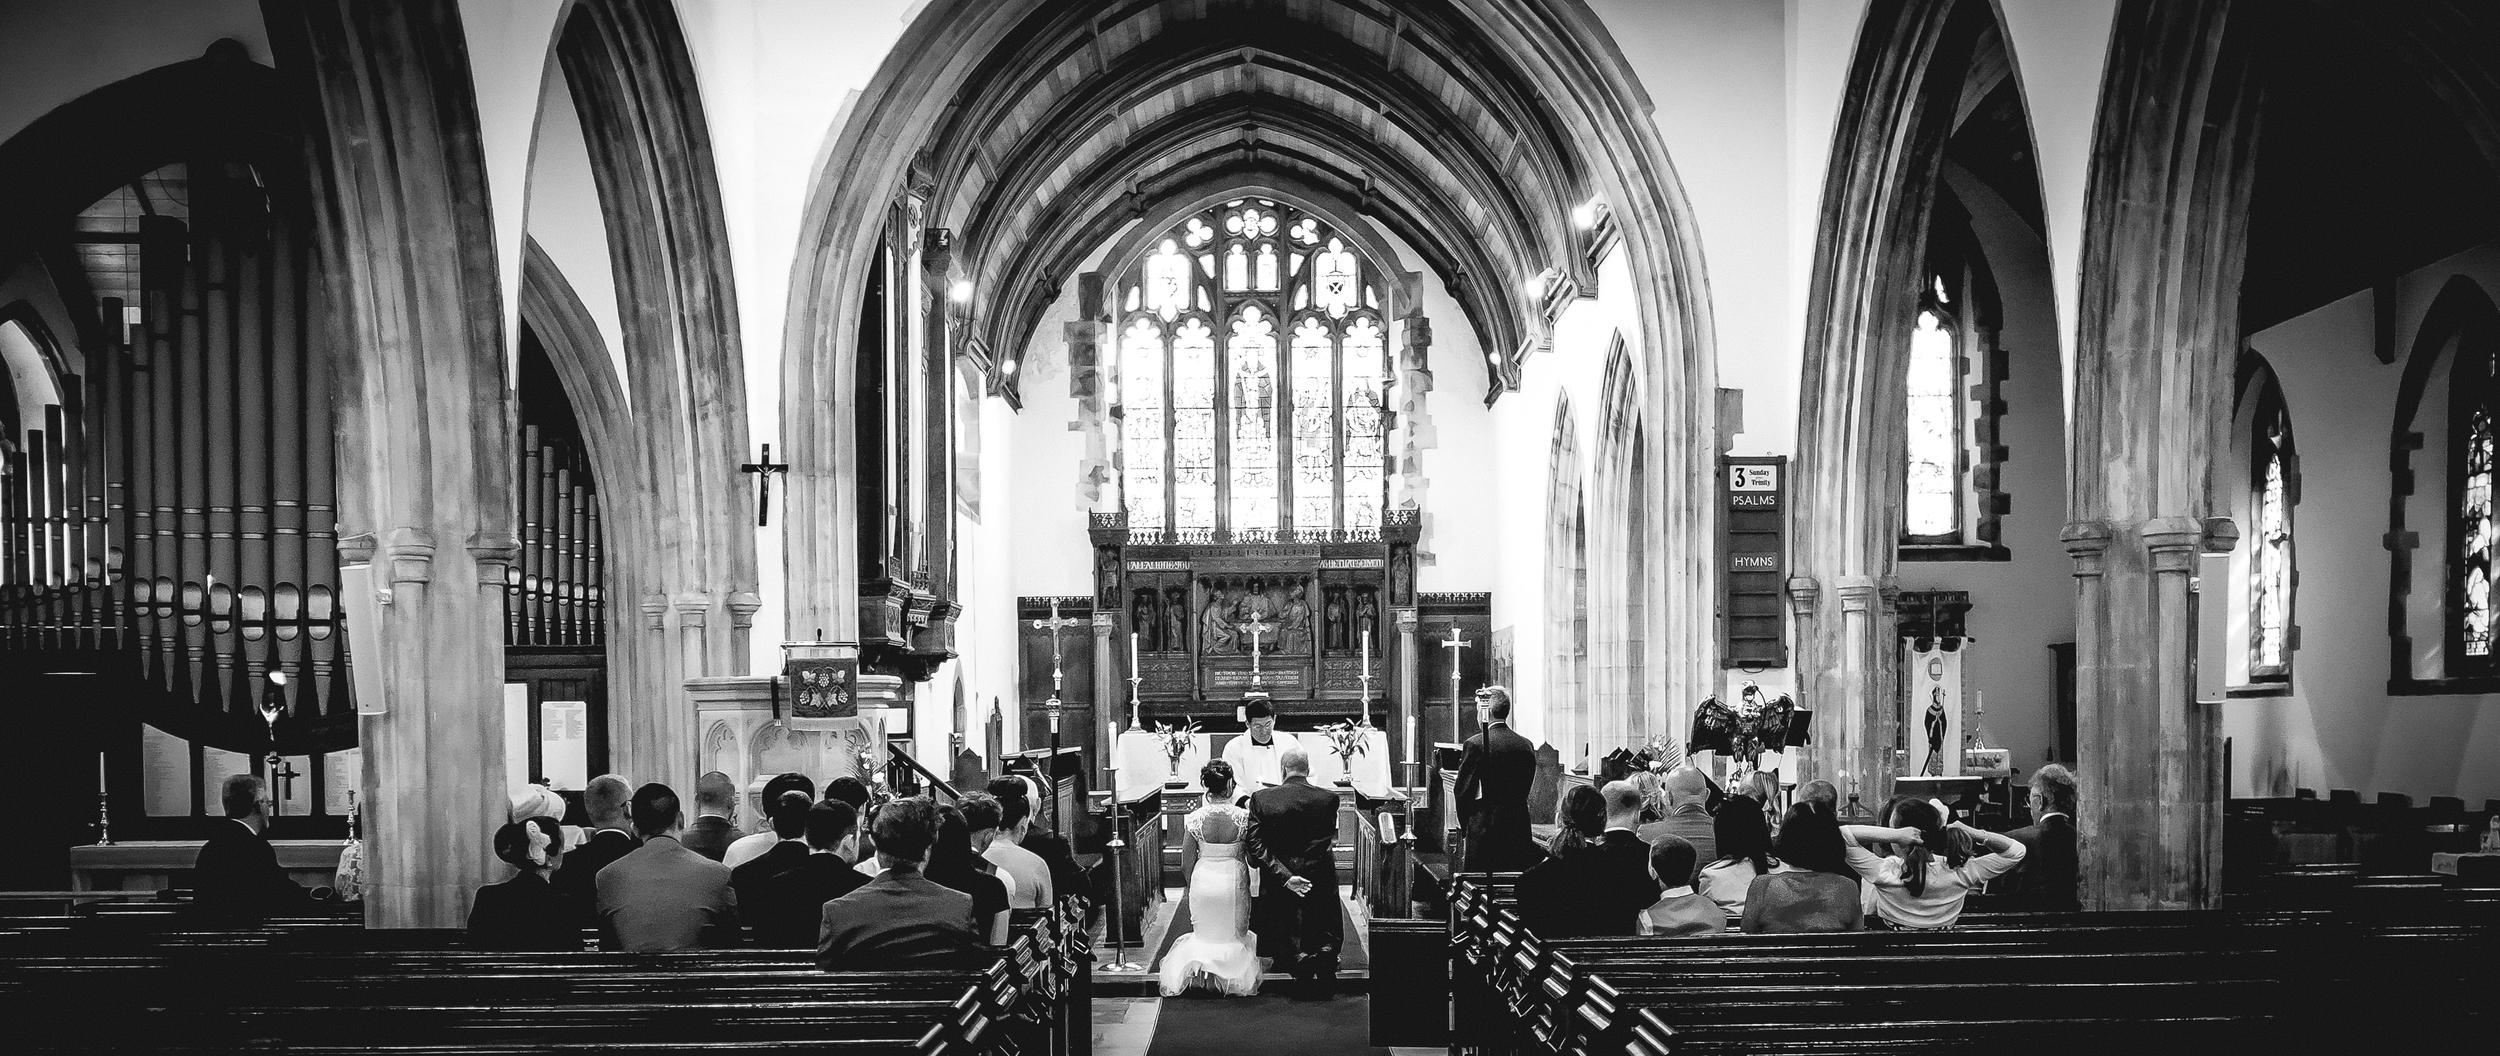 Kevin & Karen's wedding. | Fuji X100 | 23mm | F2 - 1/110 - iso5000